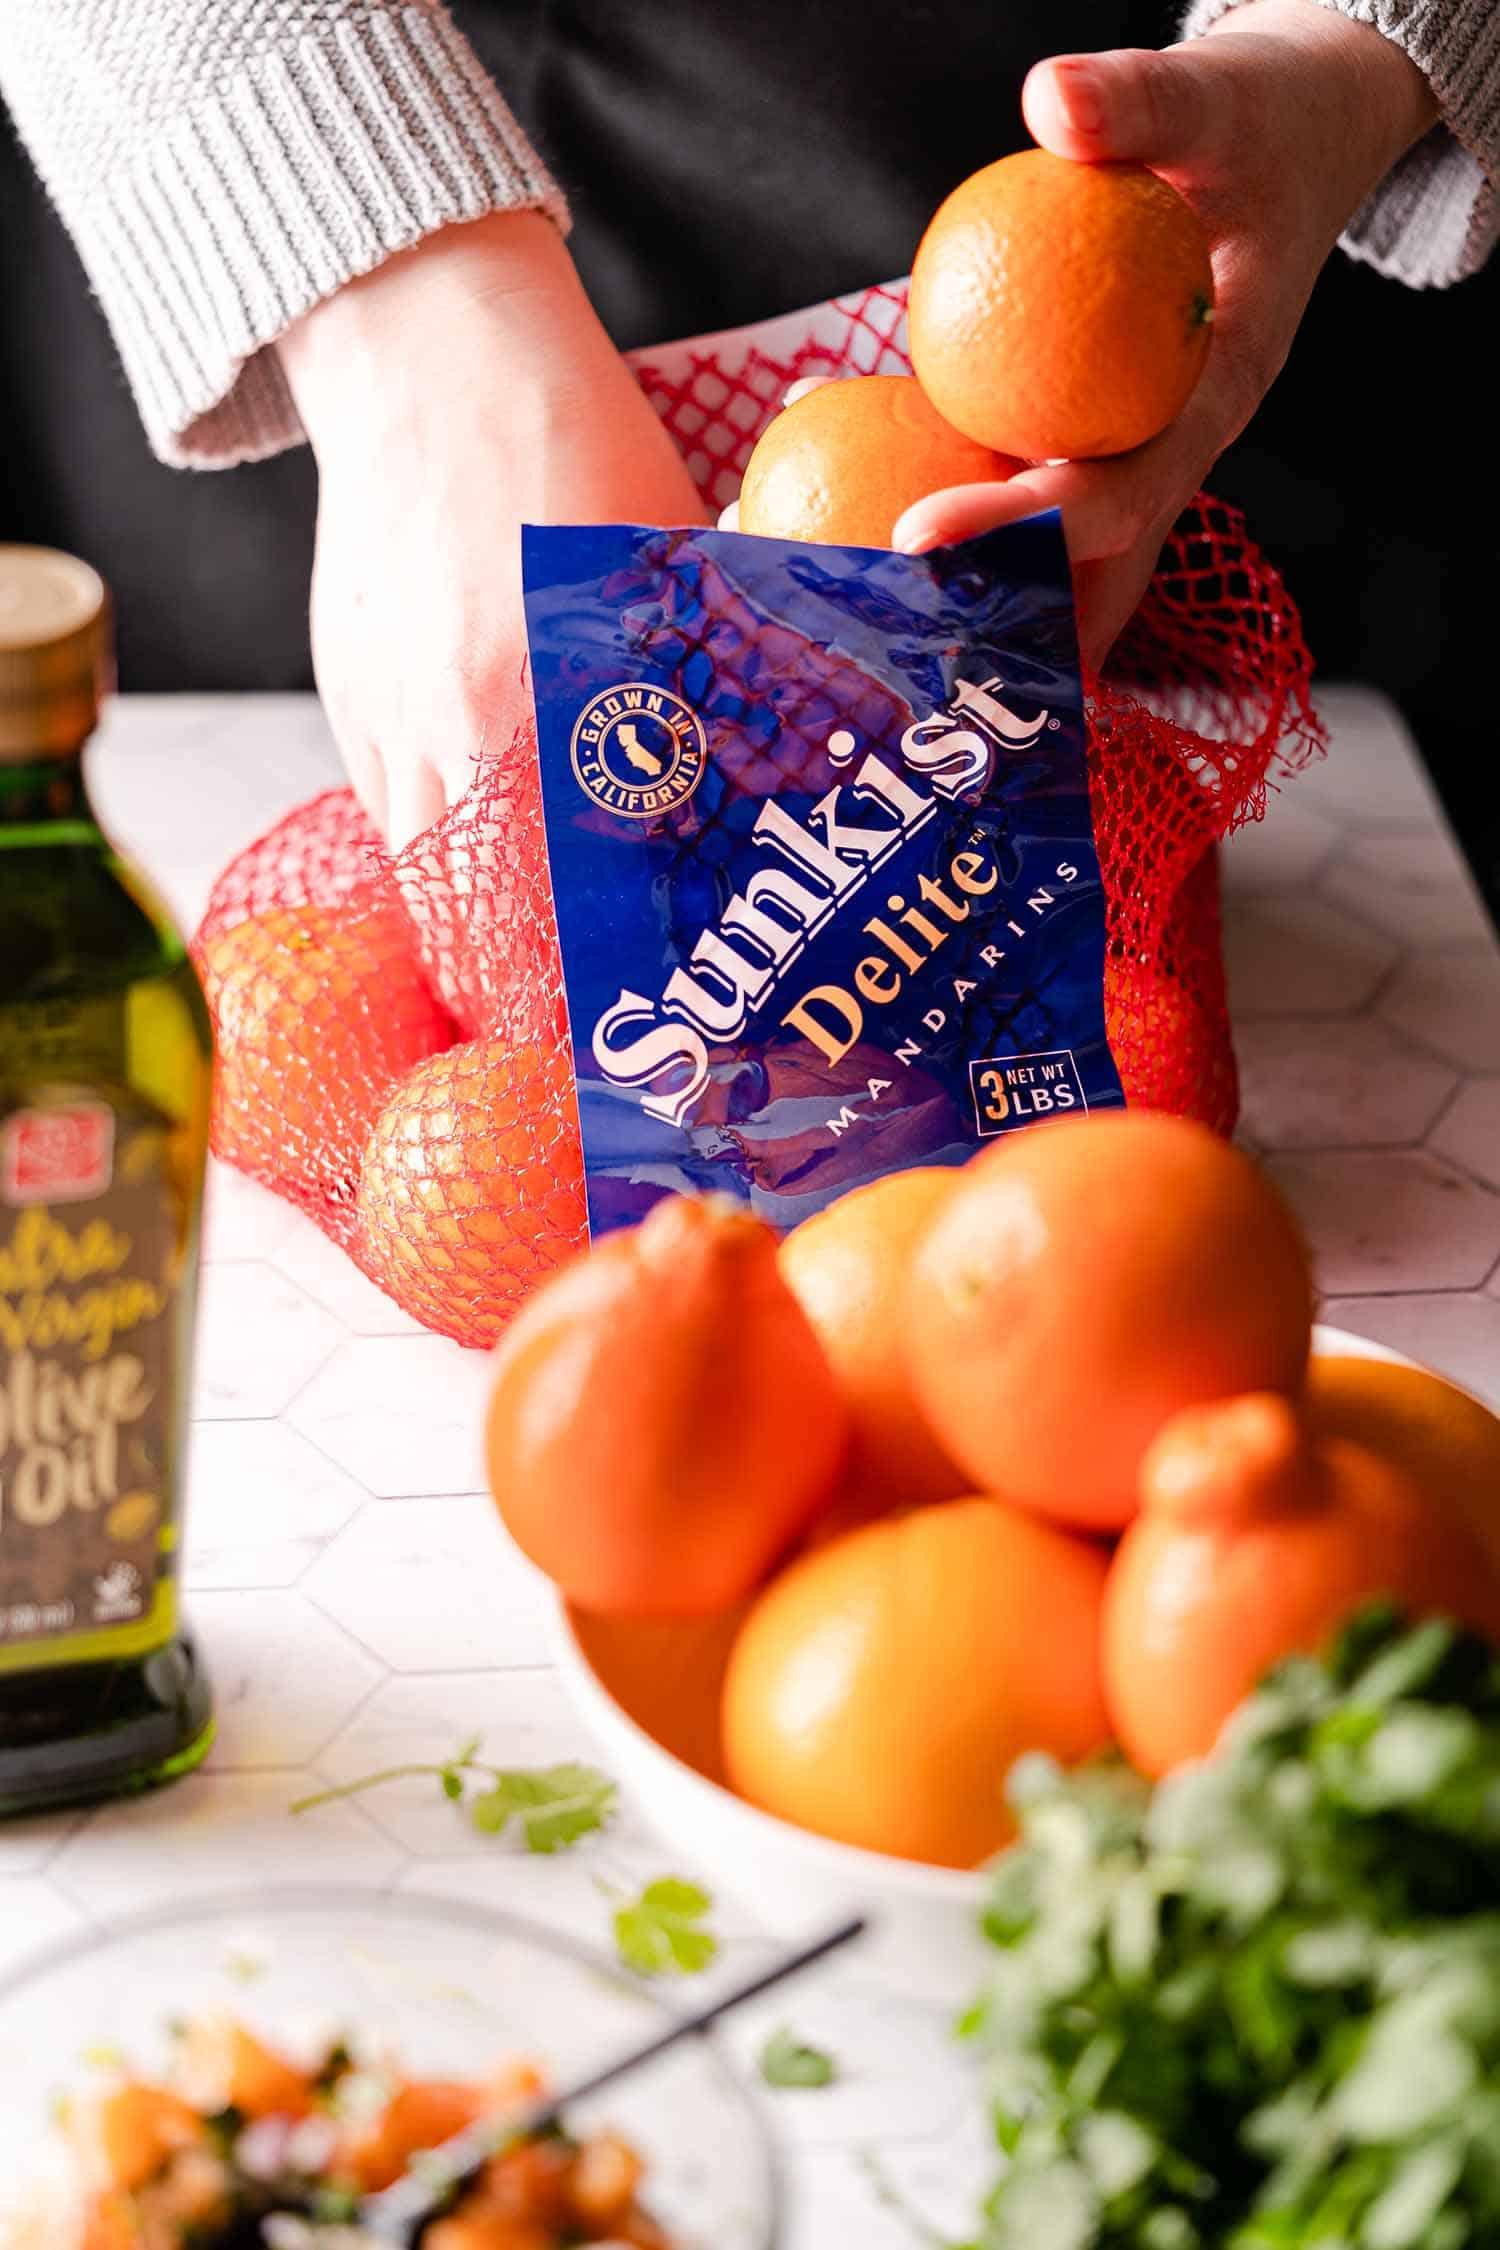 hands removing Mandarins from net bag